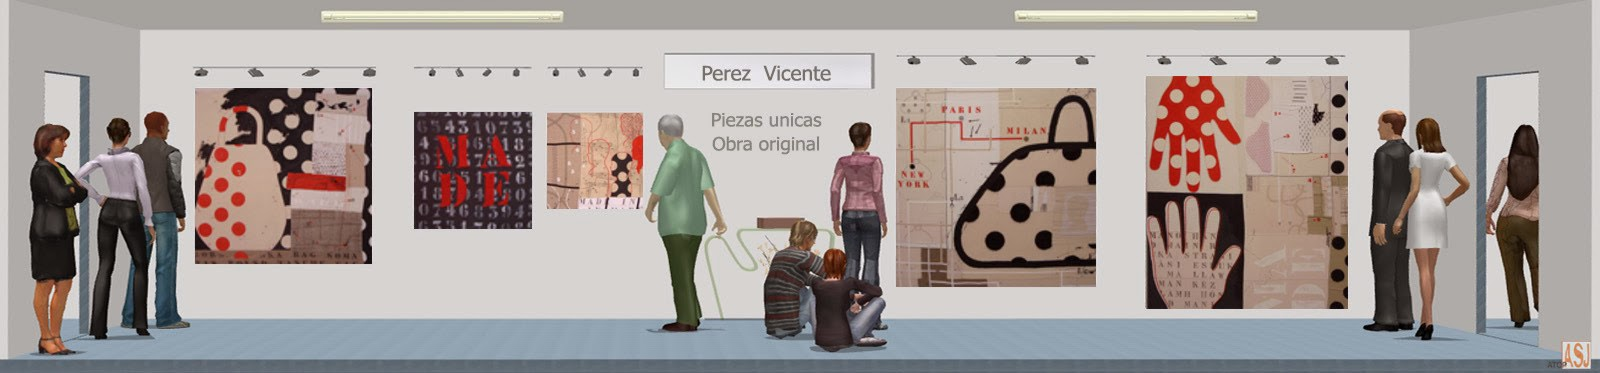 "<img src=""http://3.bp.blogspot.com/-TVATK_CK1LU/UtL8iL6MdfI/AAAAAAAATcE/zuiF-2_GHvo/s1600/sala-de-exposicion-de-perez-vicente.jpg"" alt="" sala de exposición virtual de pinturas de la pintora pérez vicente""/>"